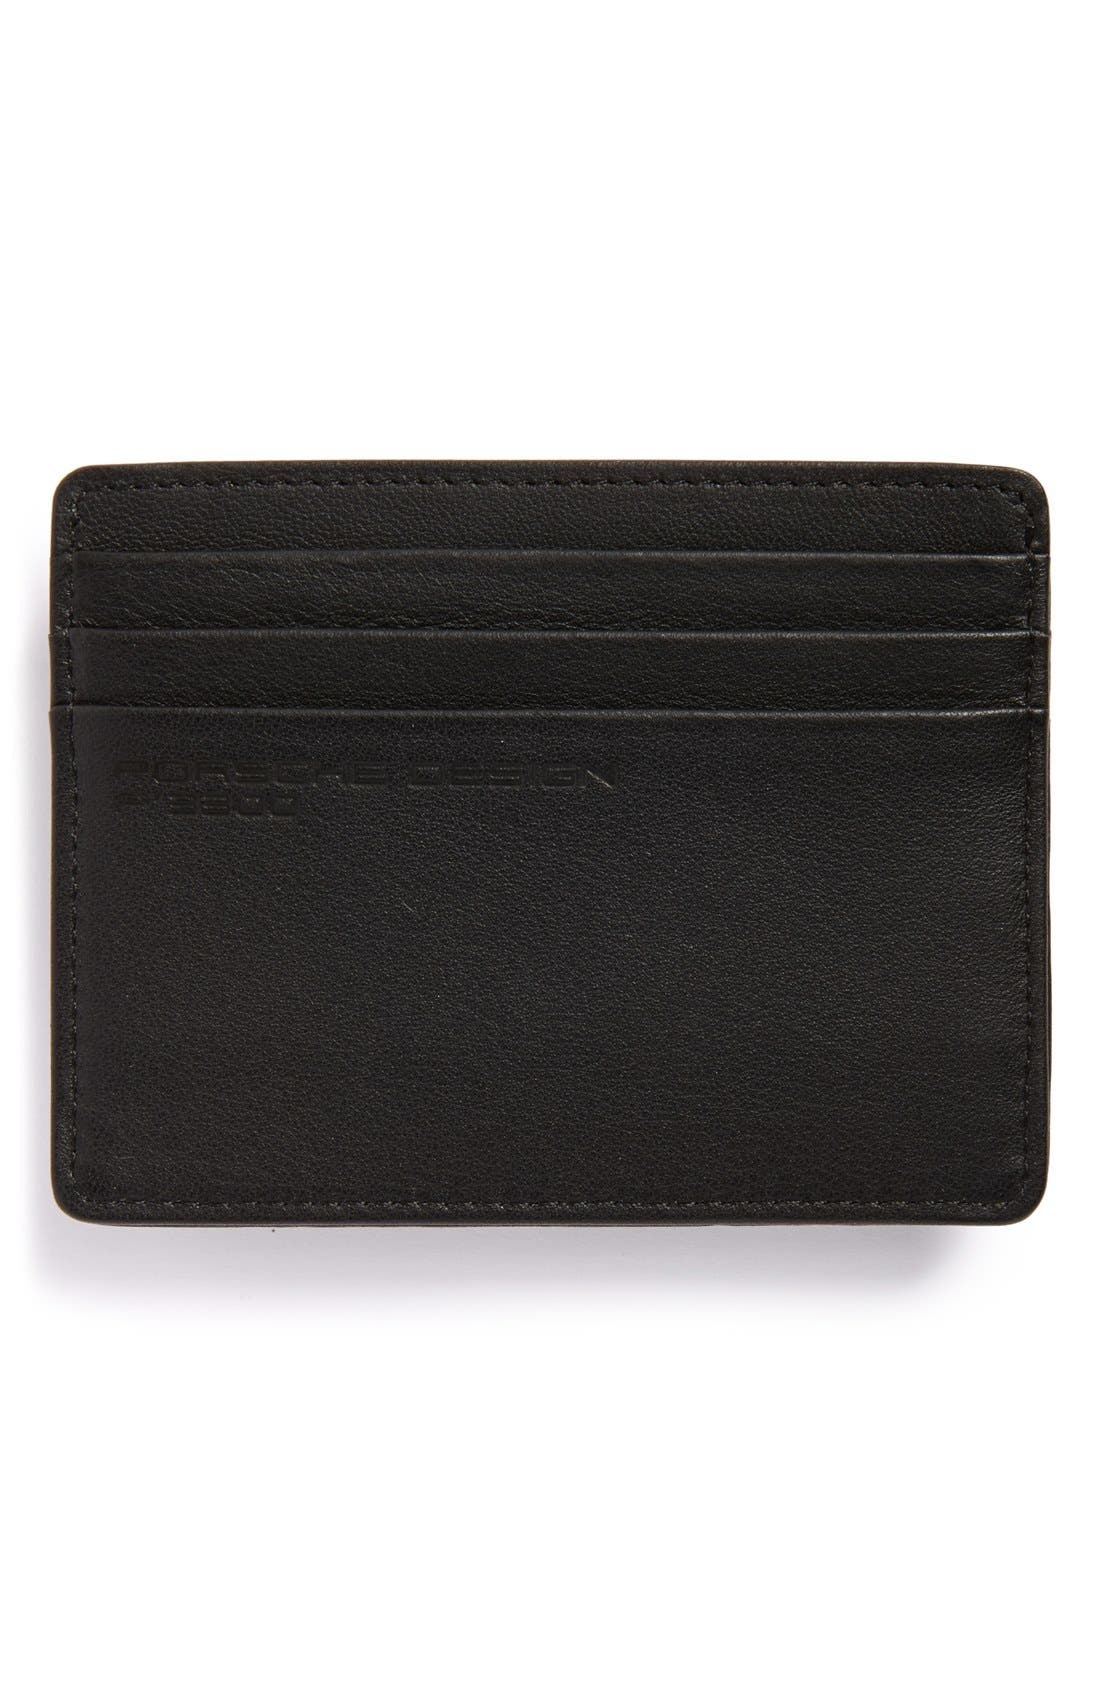 Leather Cardholder,                             Alternate thumbnail 2, color,                             001